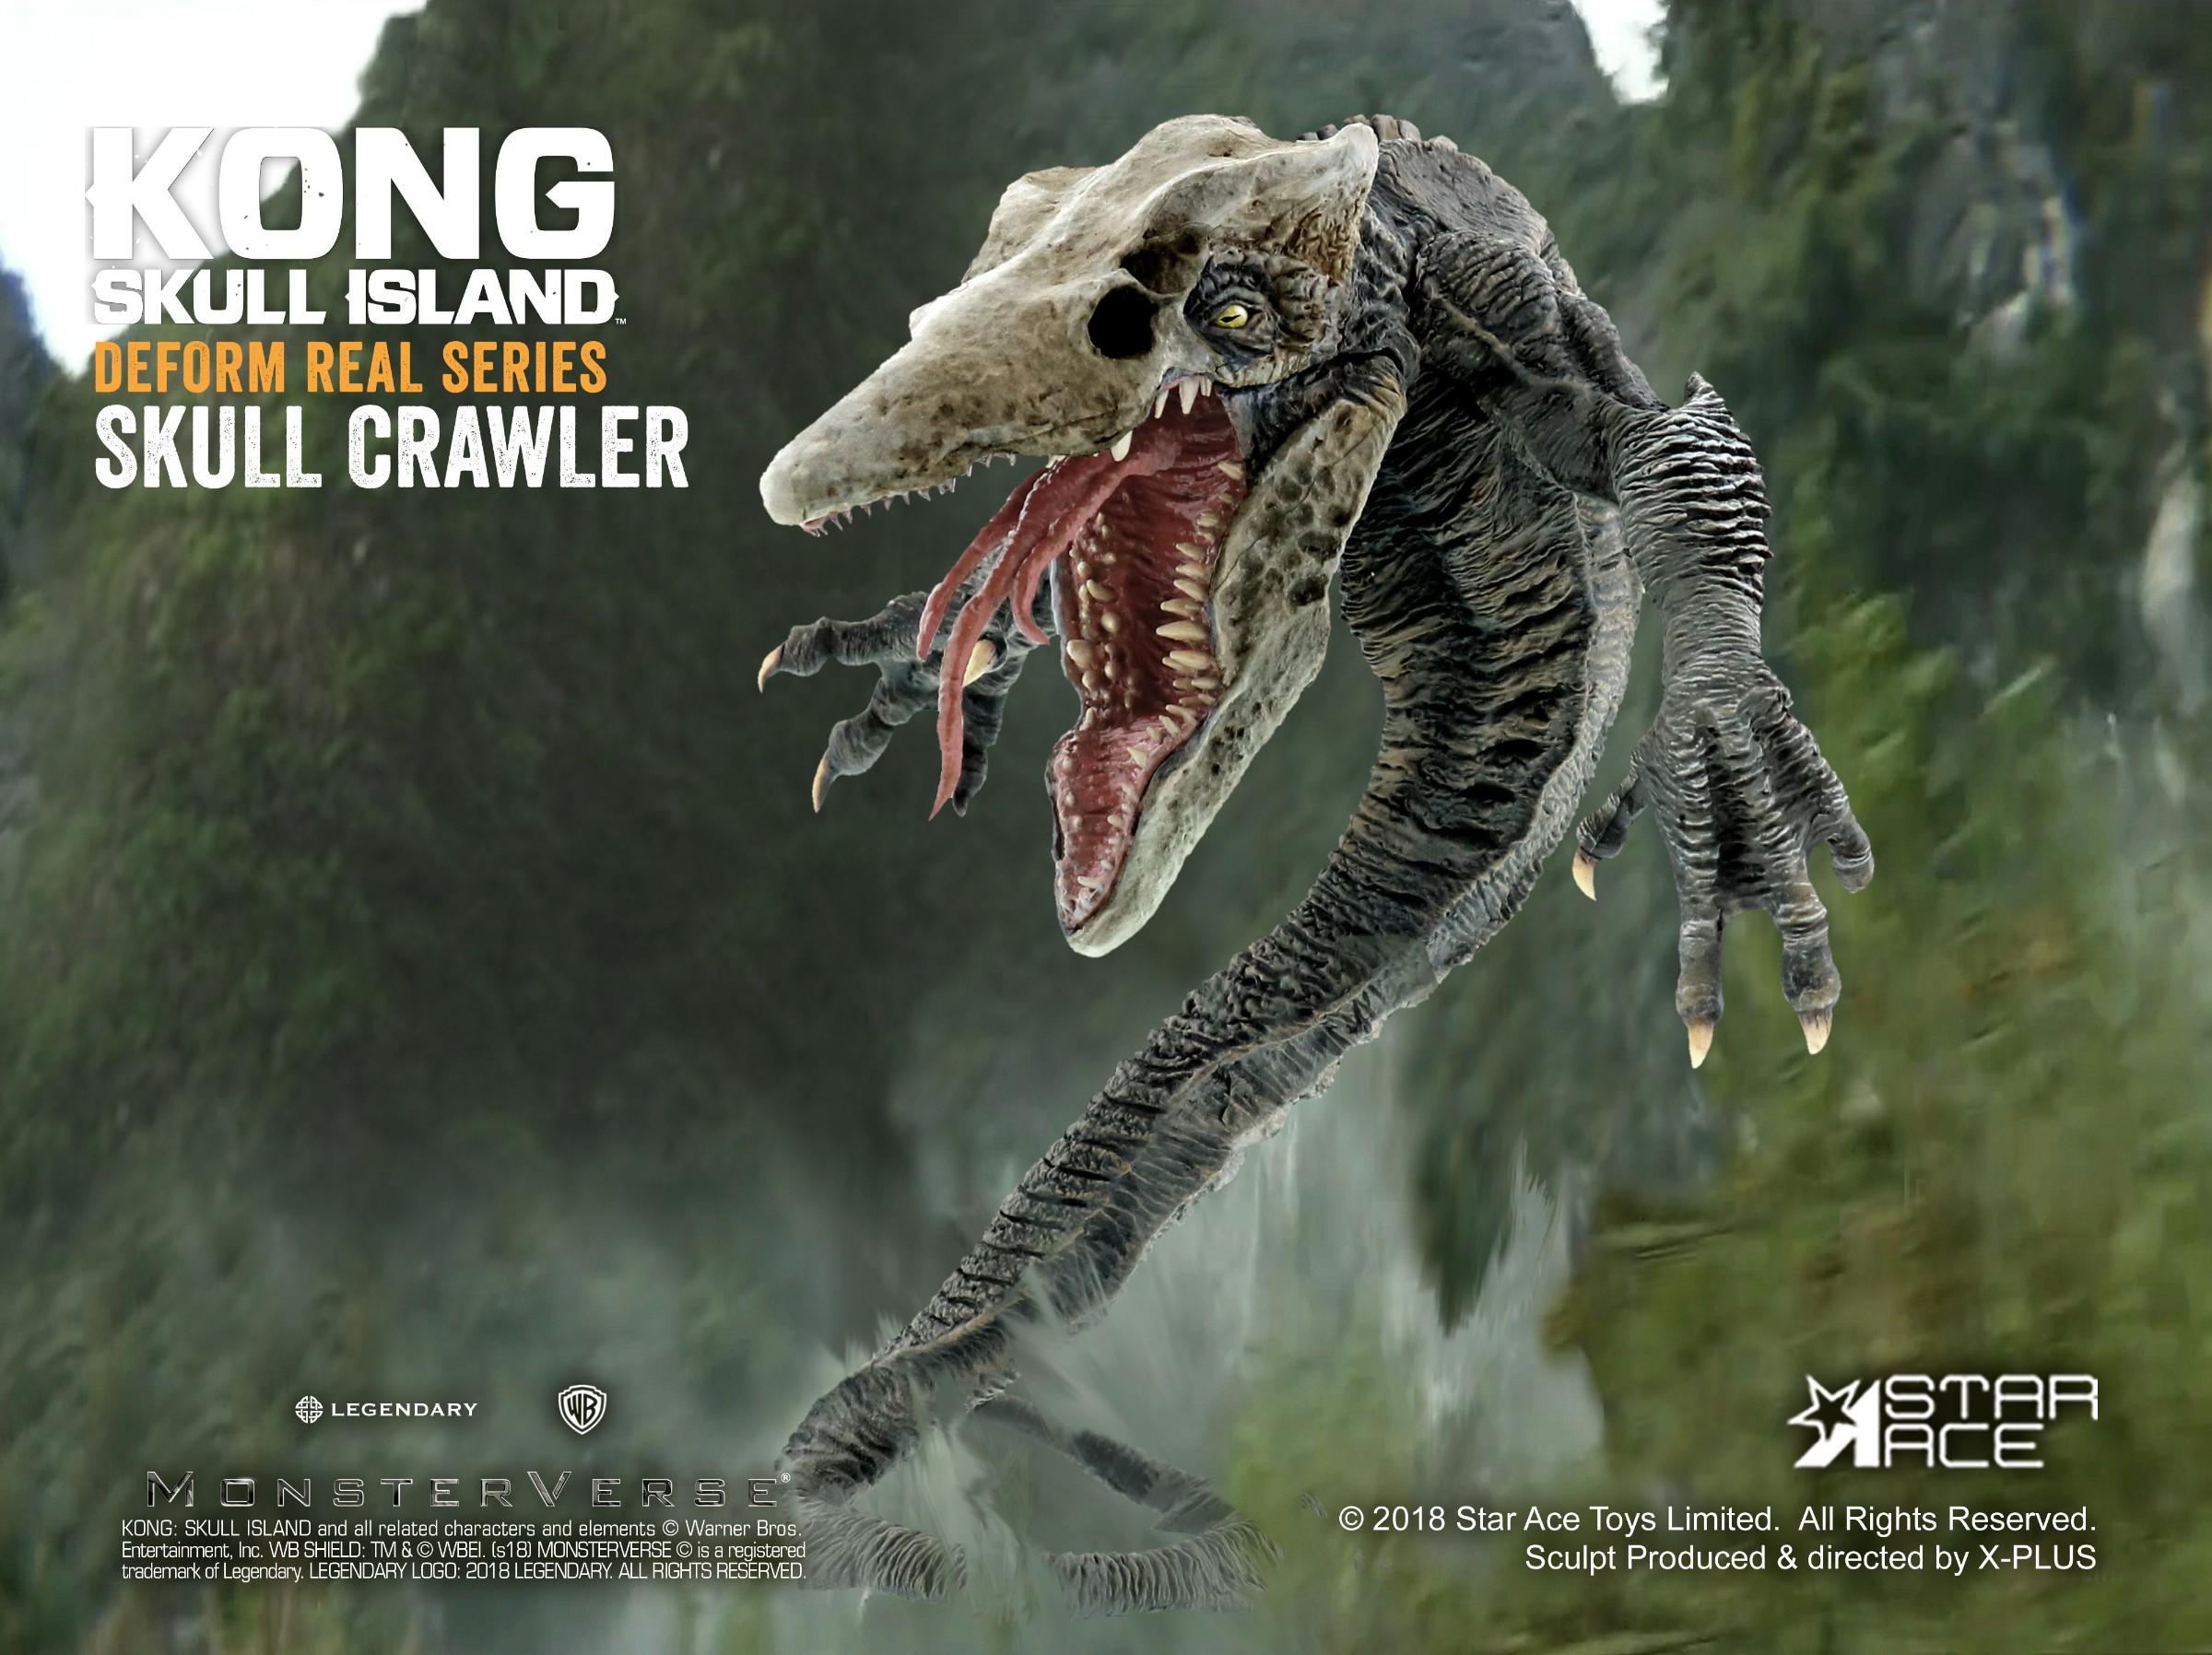 Sa6002 Star Ace Df Skull Crawler Deform Real Series 16